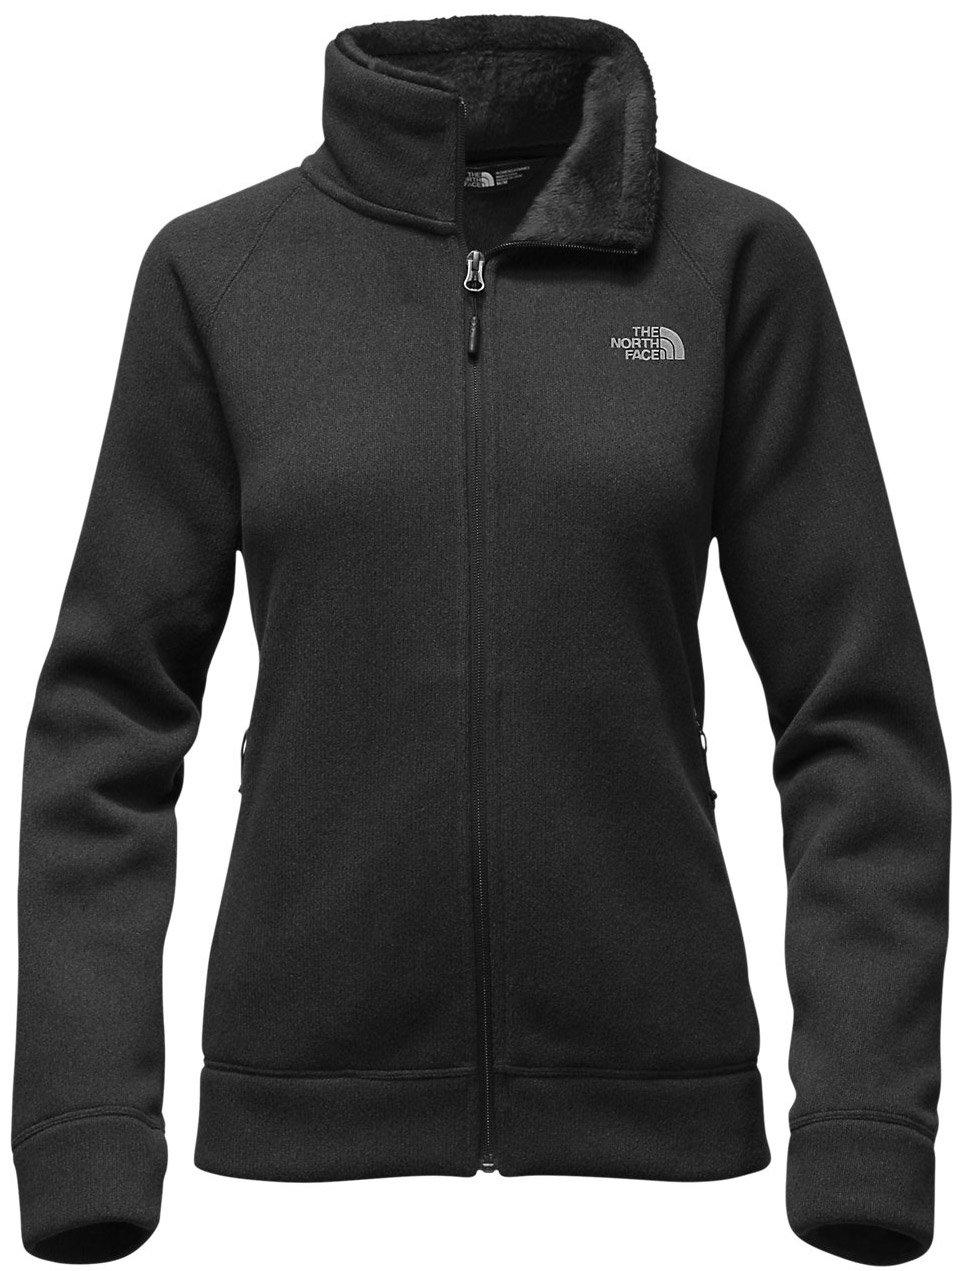 The North Face Crescent Raschel Full Zip Jacket Women's TNF Black Heather X-Large